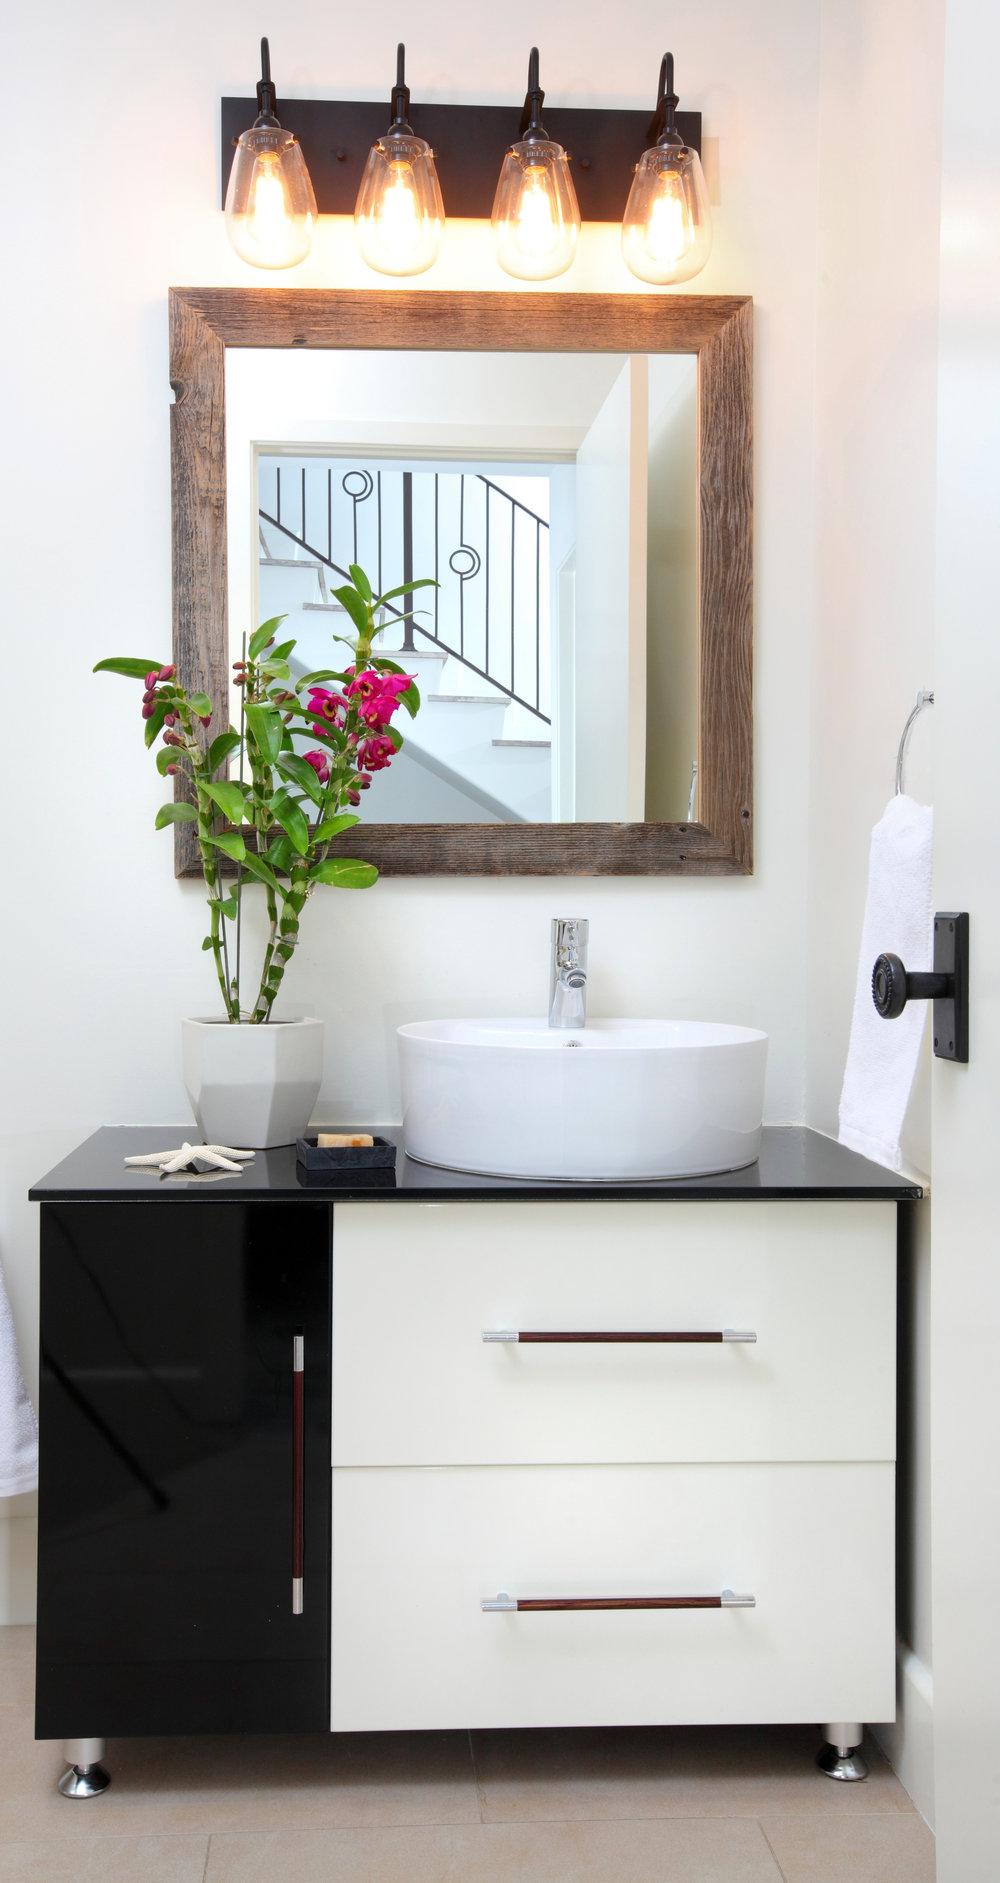 Sarah Barnard Design - Park View Pied-à-terre: Guest Bathrooms: Blog